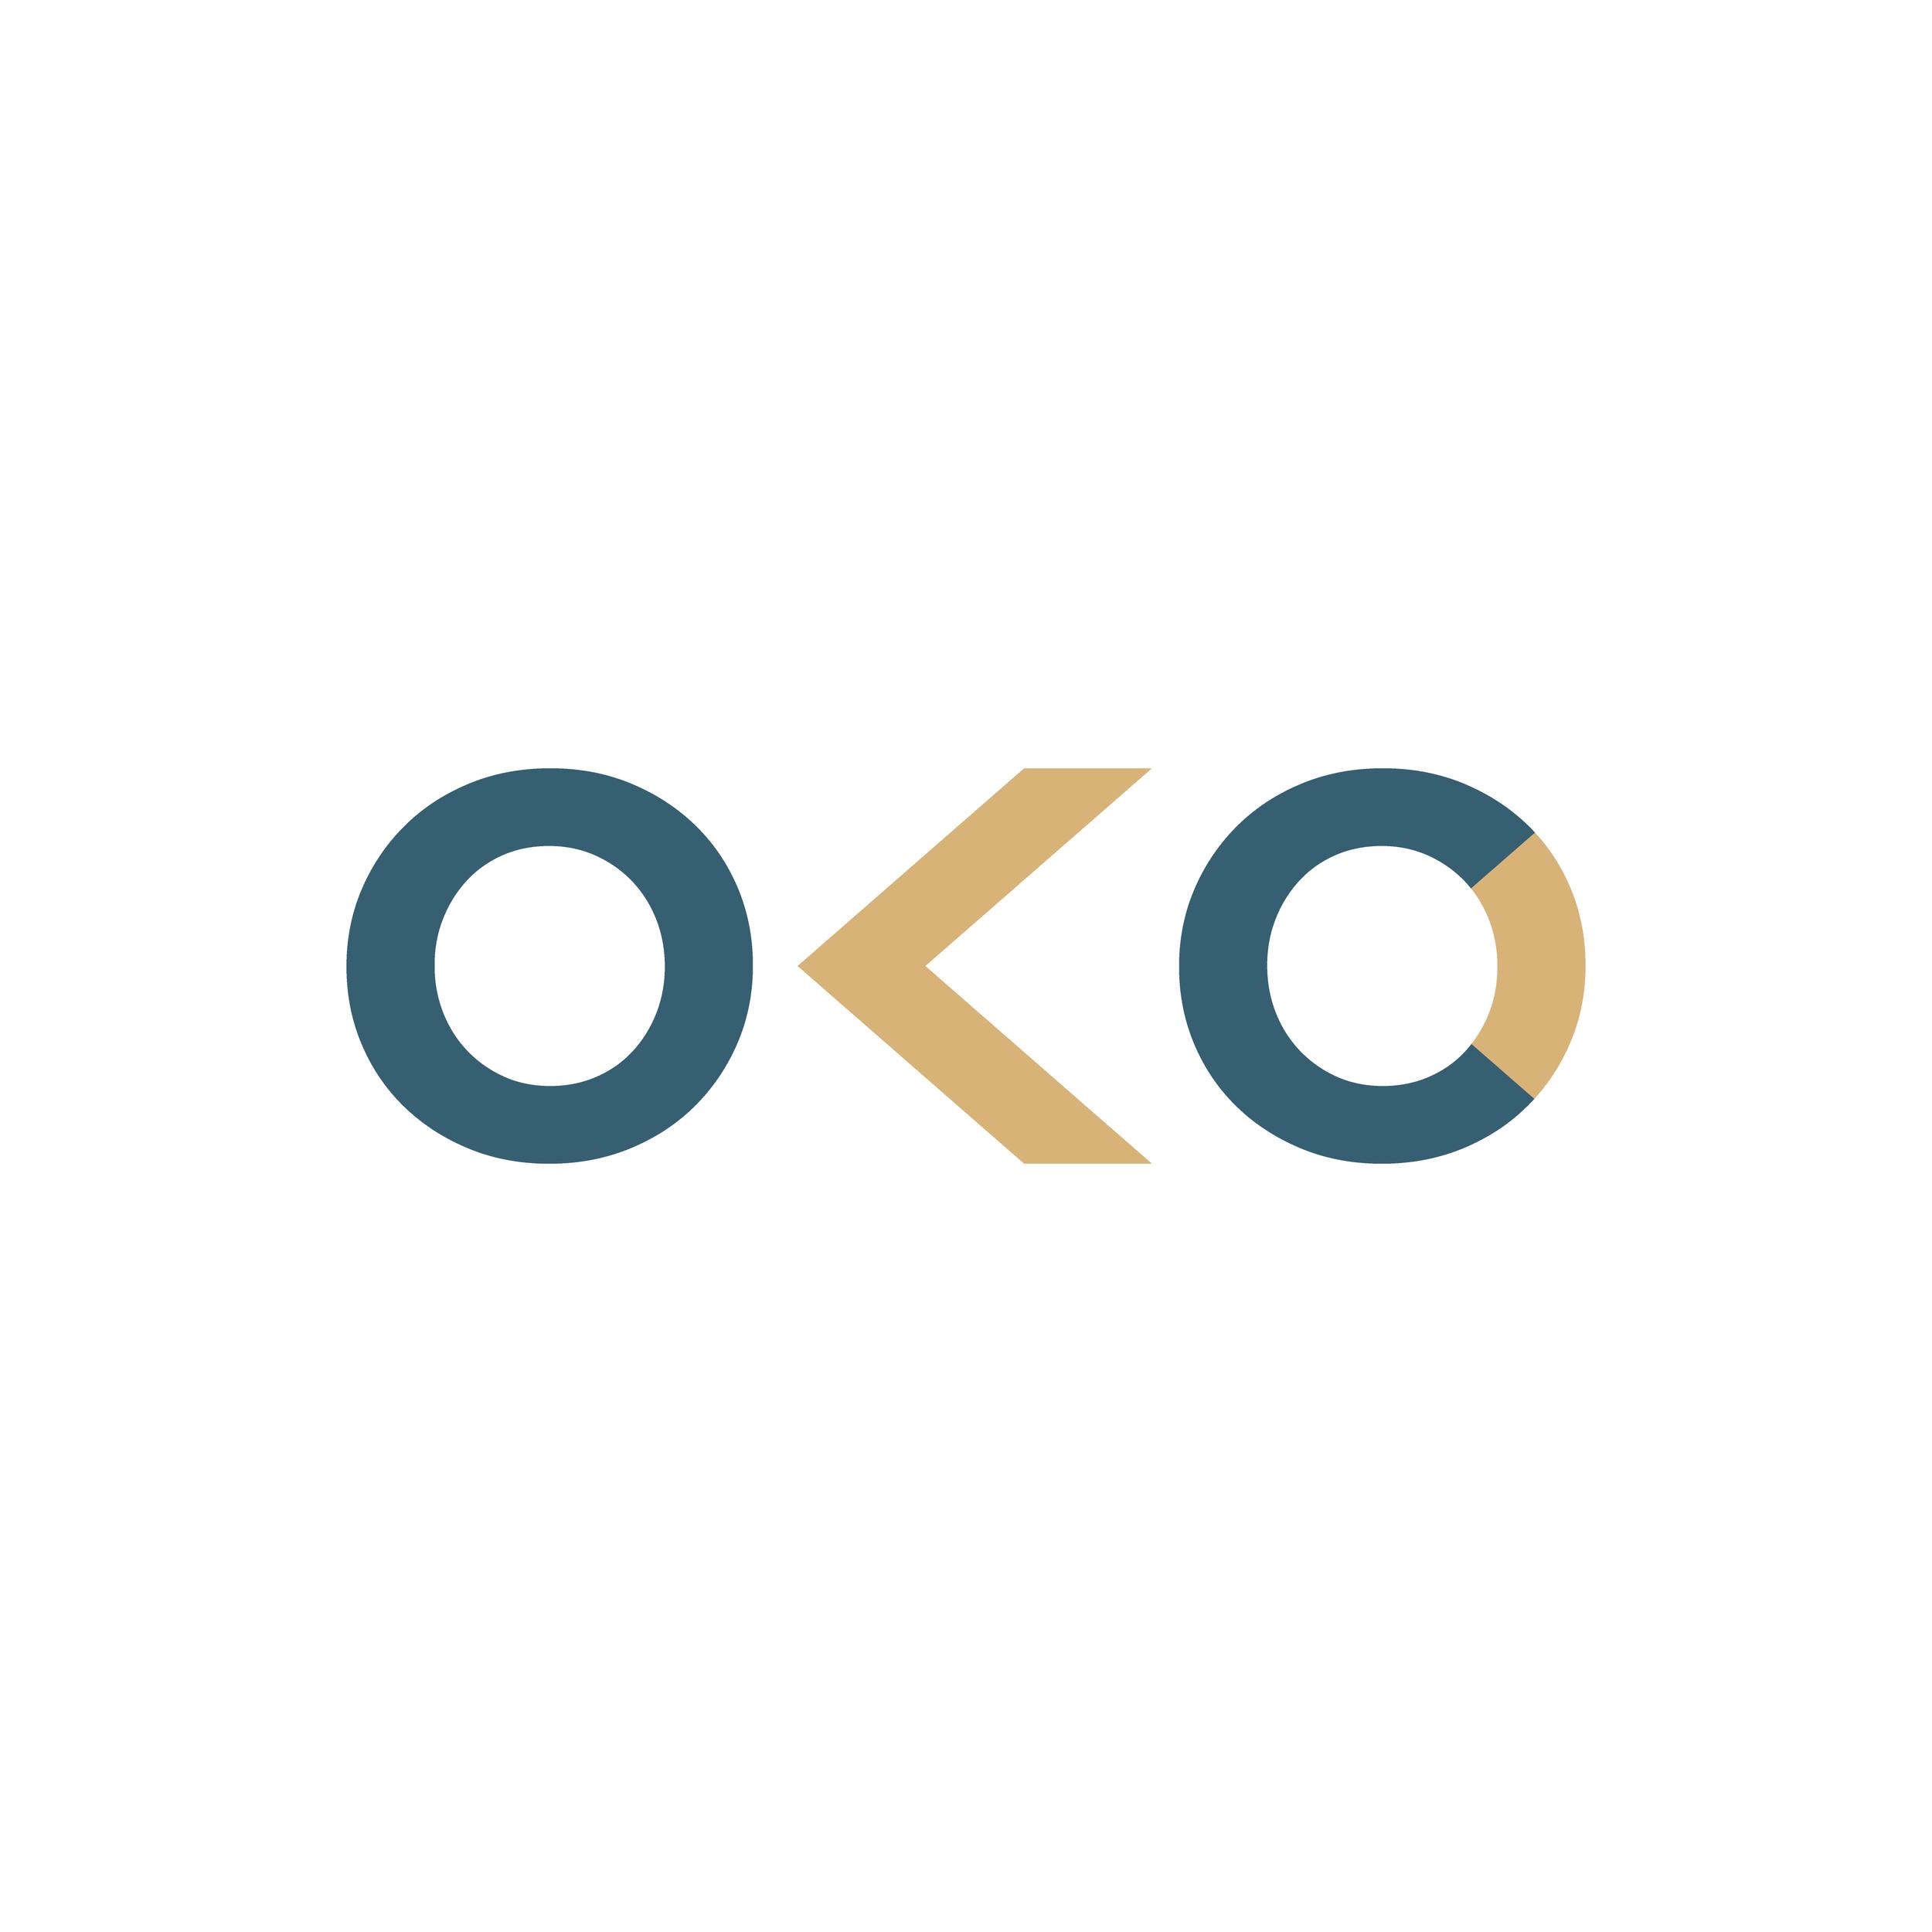 Copy of OKC Optical